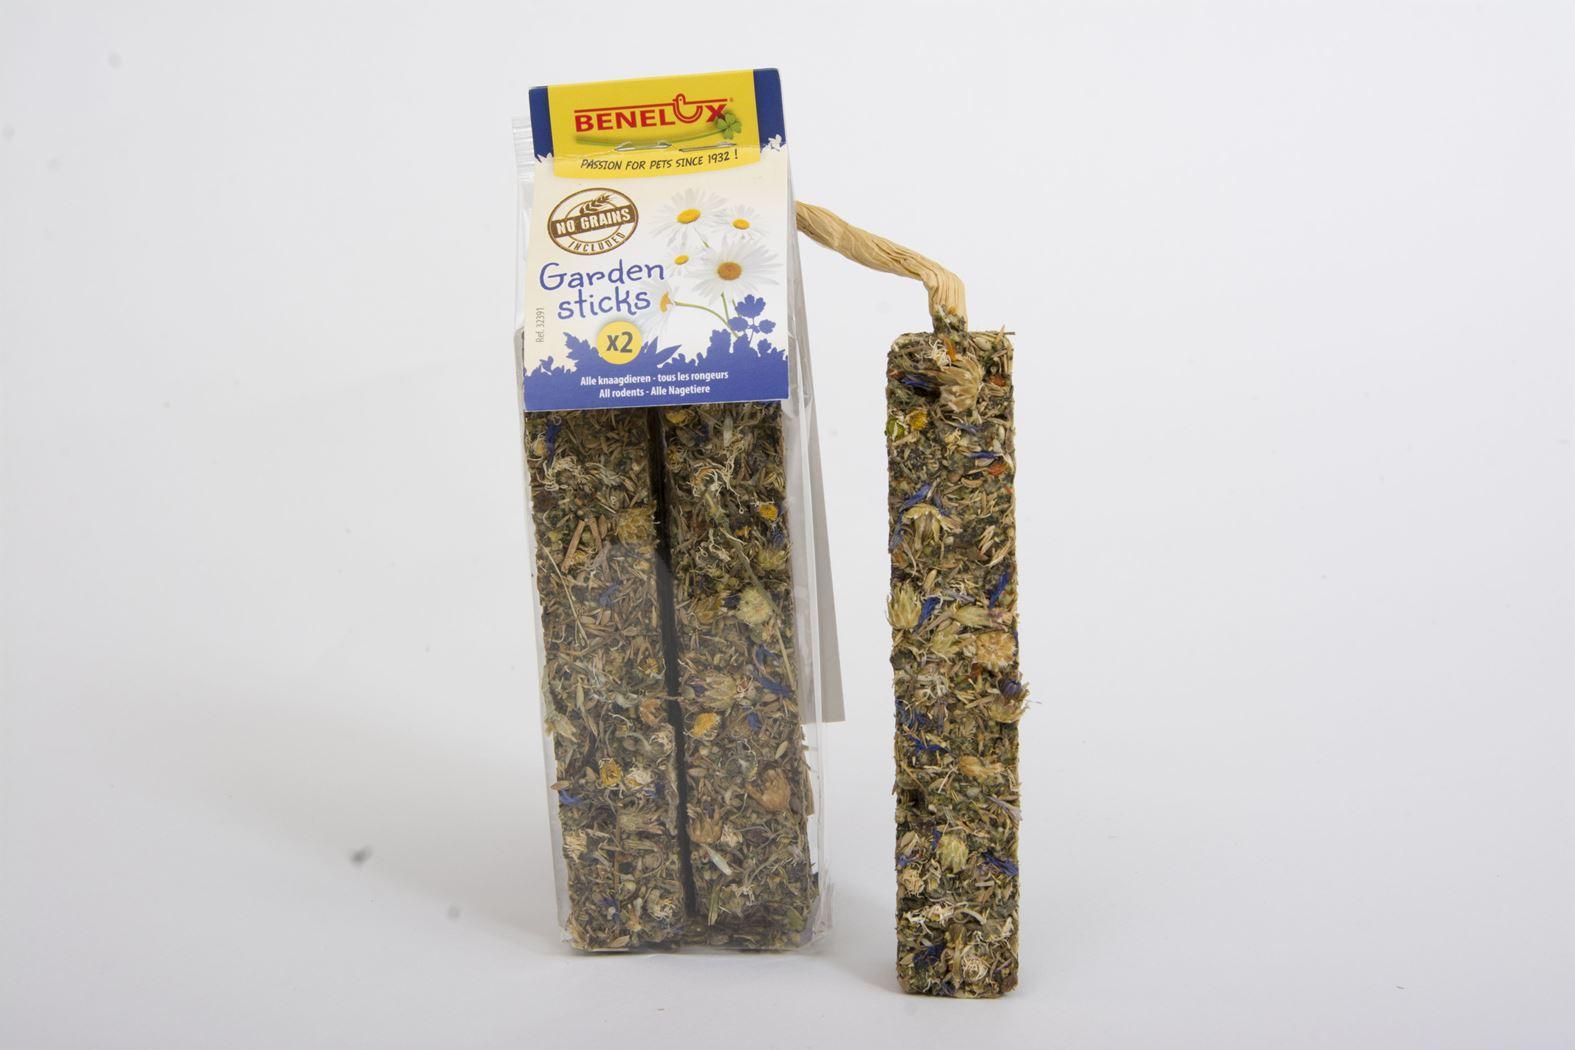 benelux sticks garden grain free (2sts)